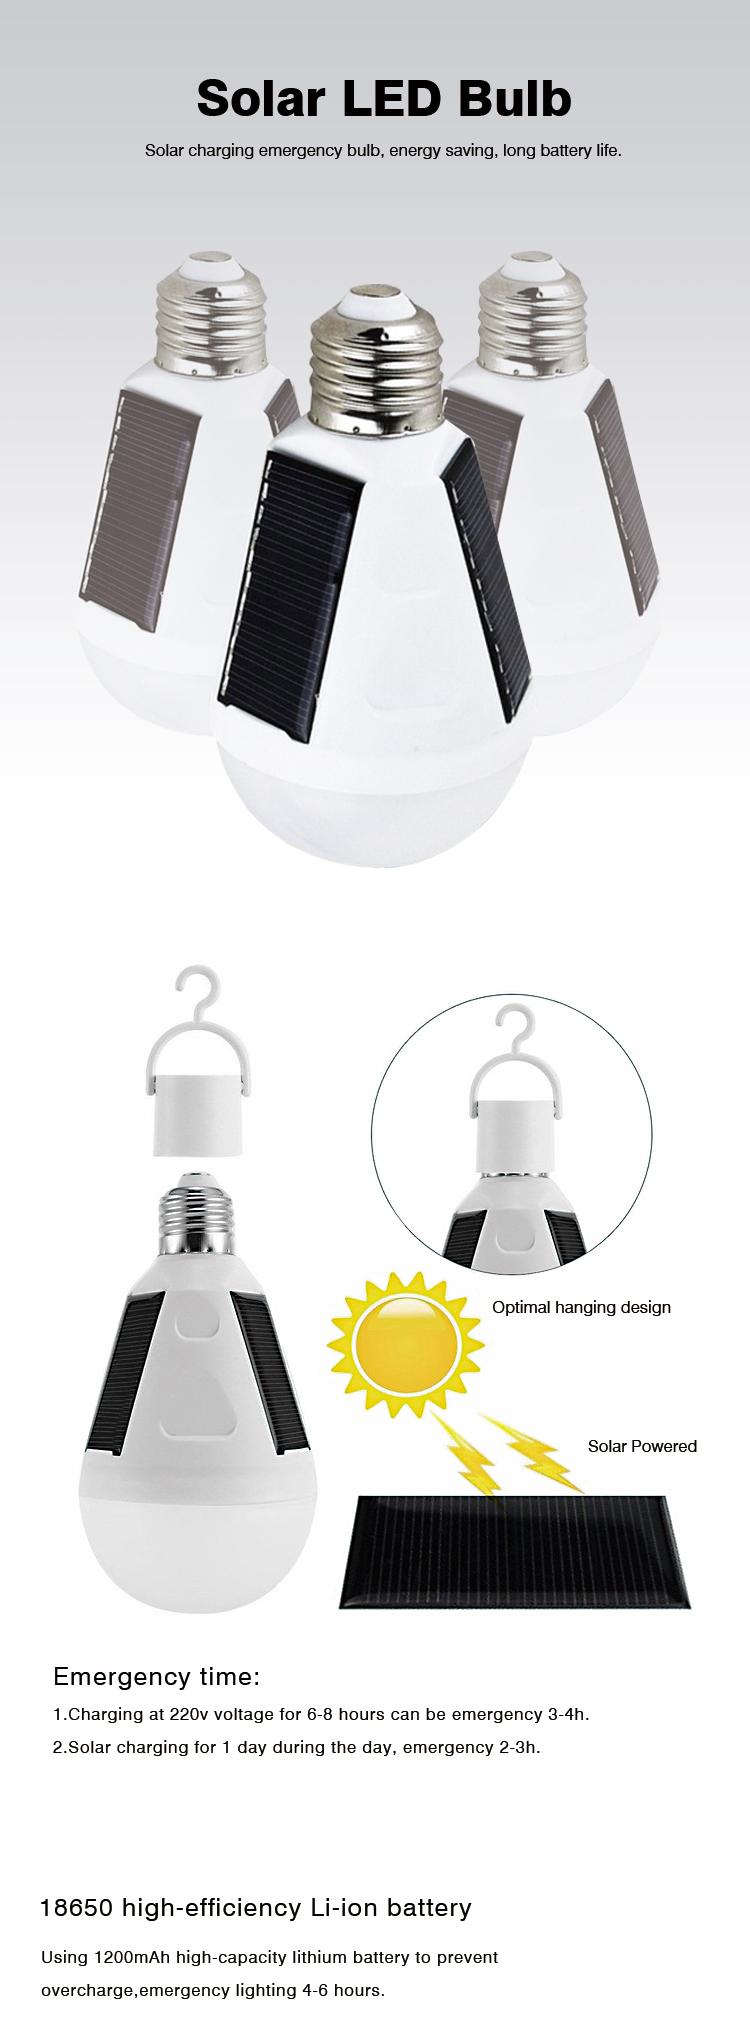 solar-LED-bulb_01.jpg